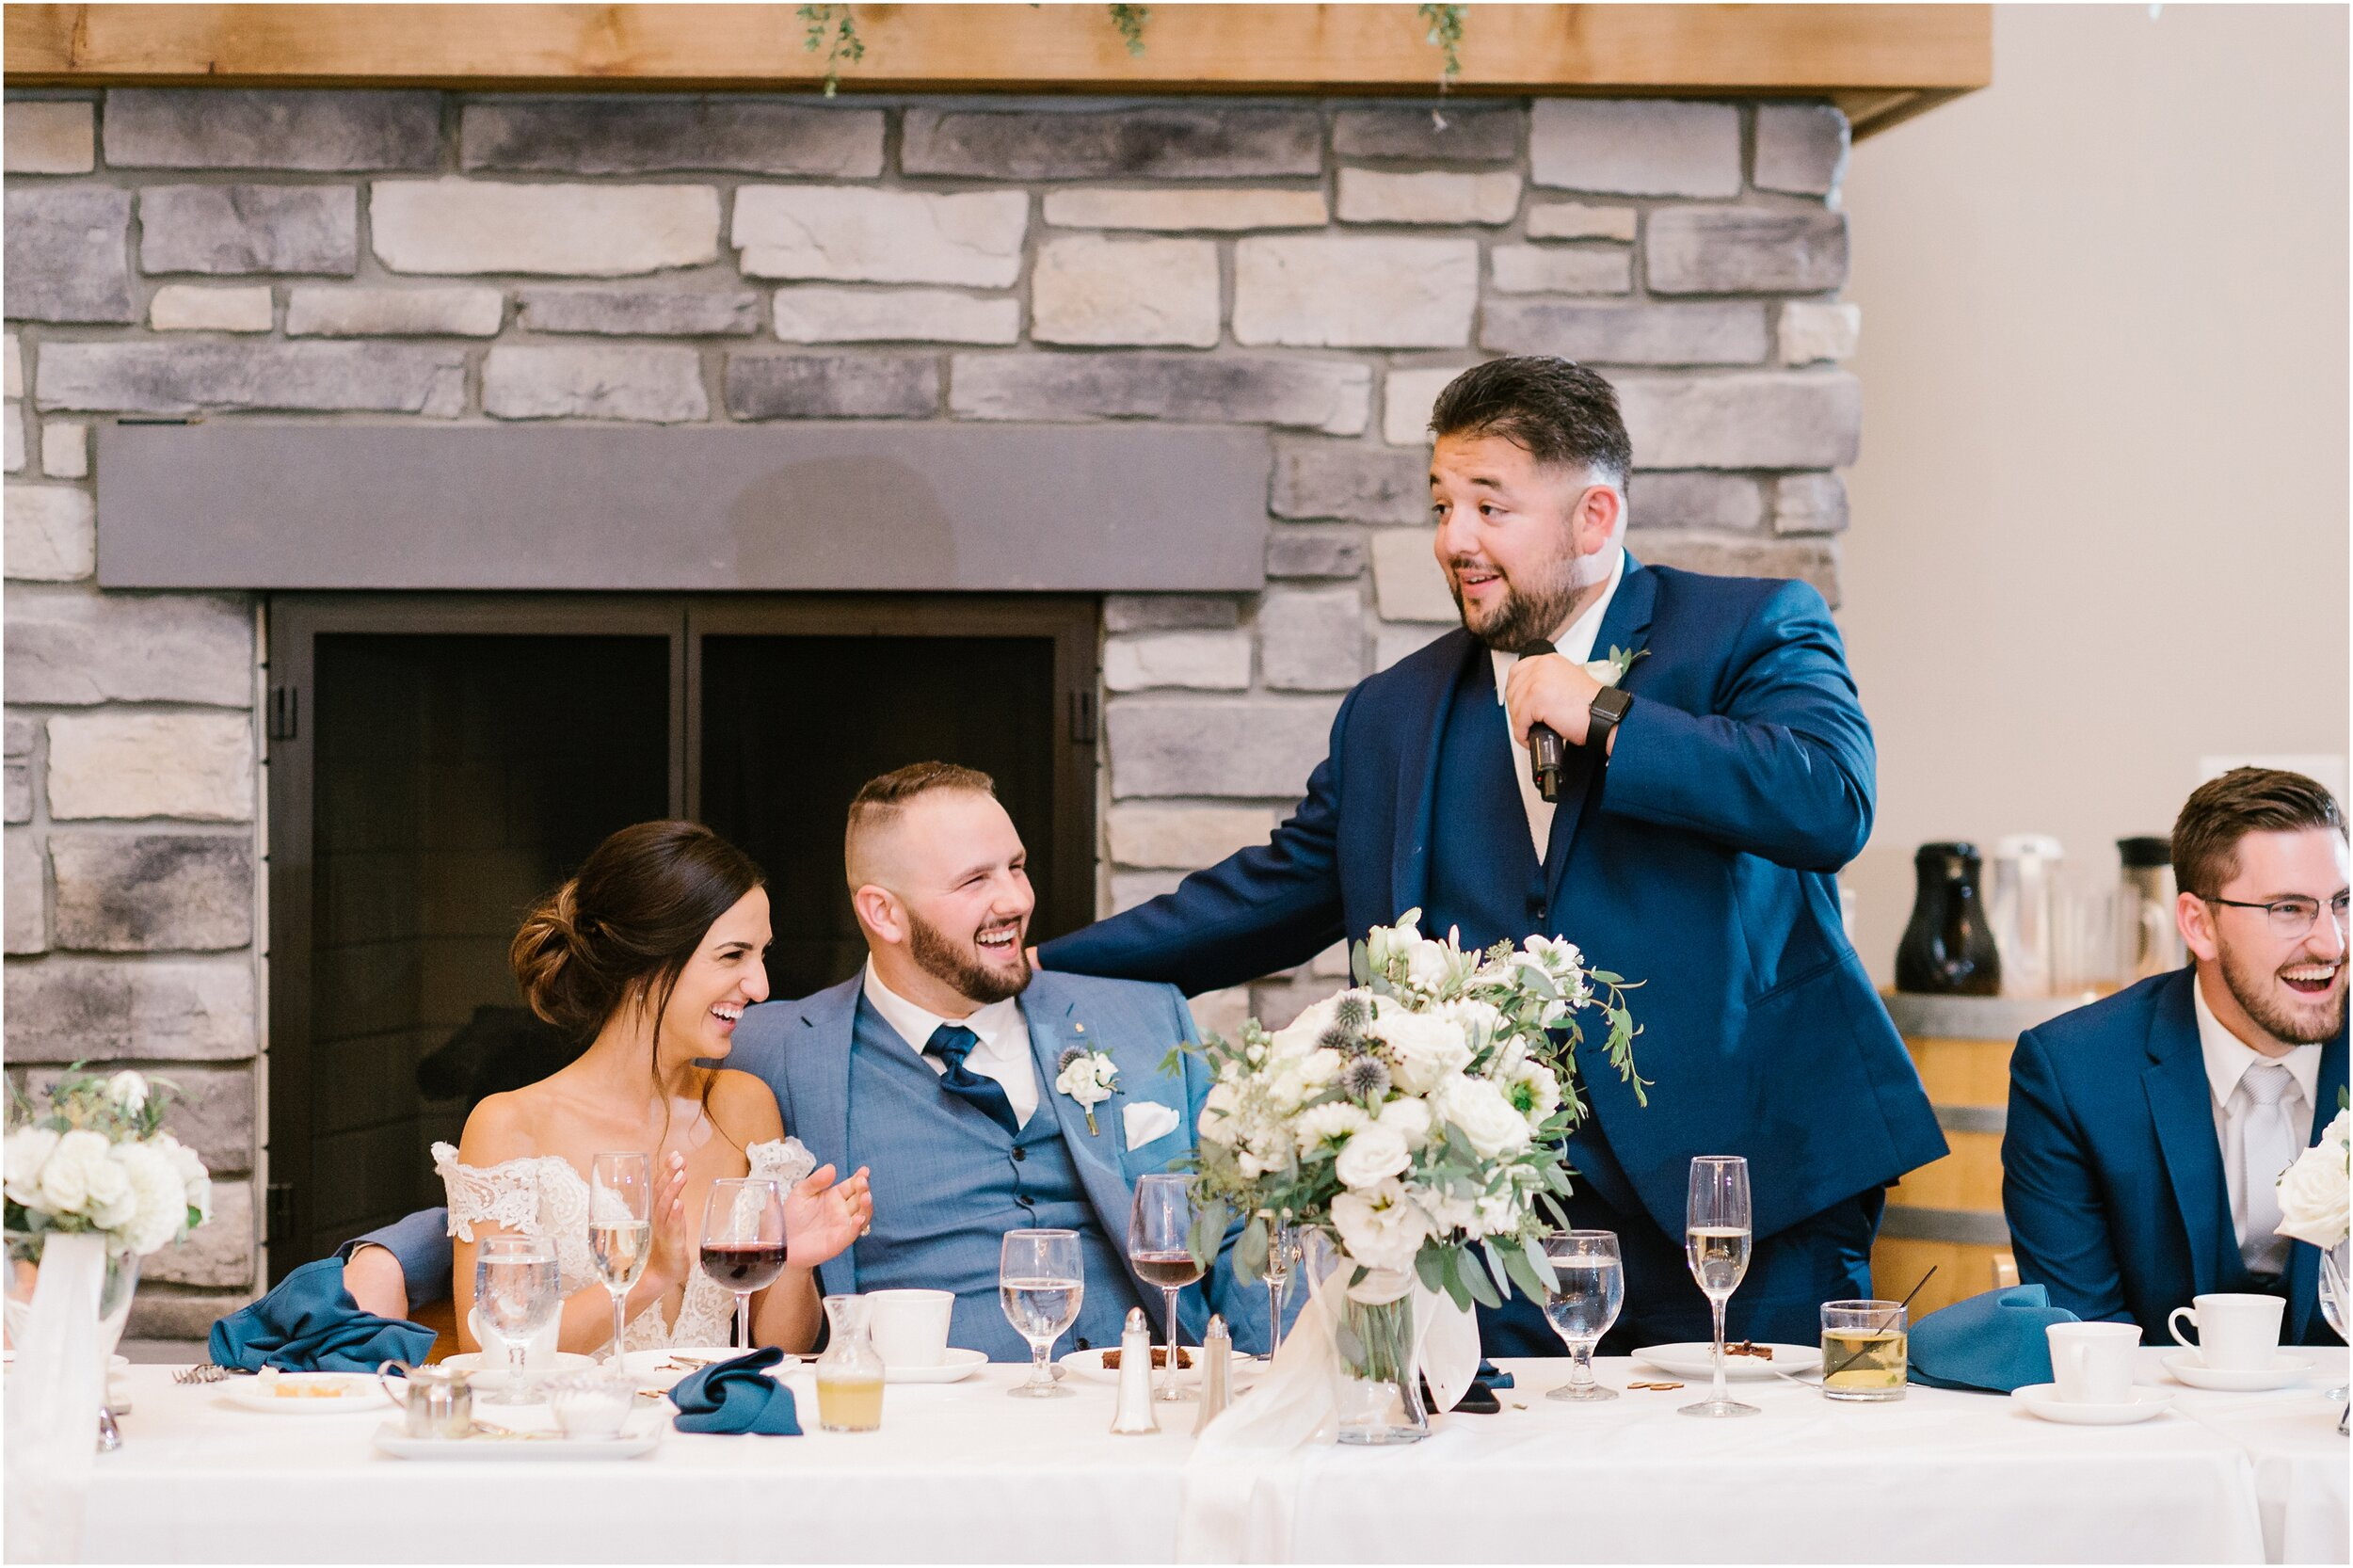 Rebecca Shehorn Photography Indianapolis Wedding Photographer Sycamore at Mallow Run_0775.jpg